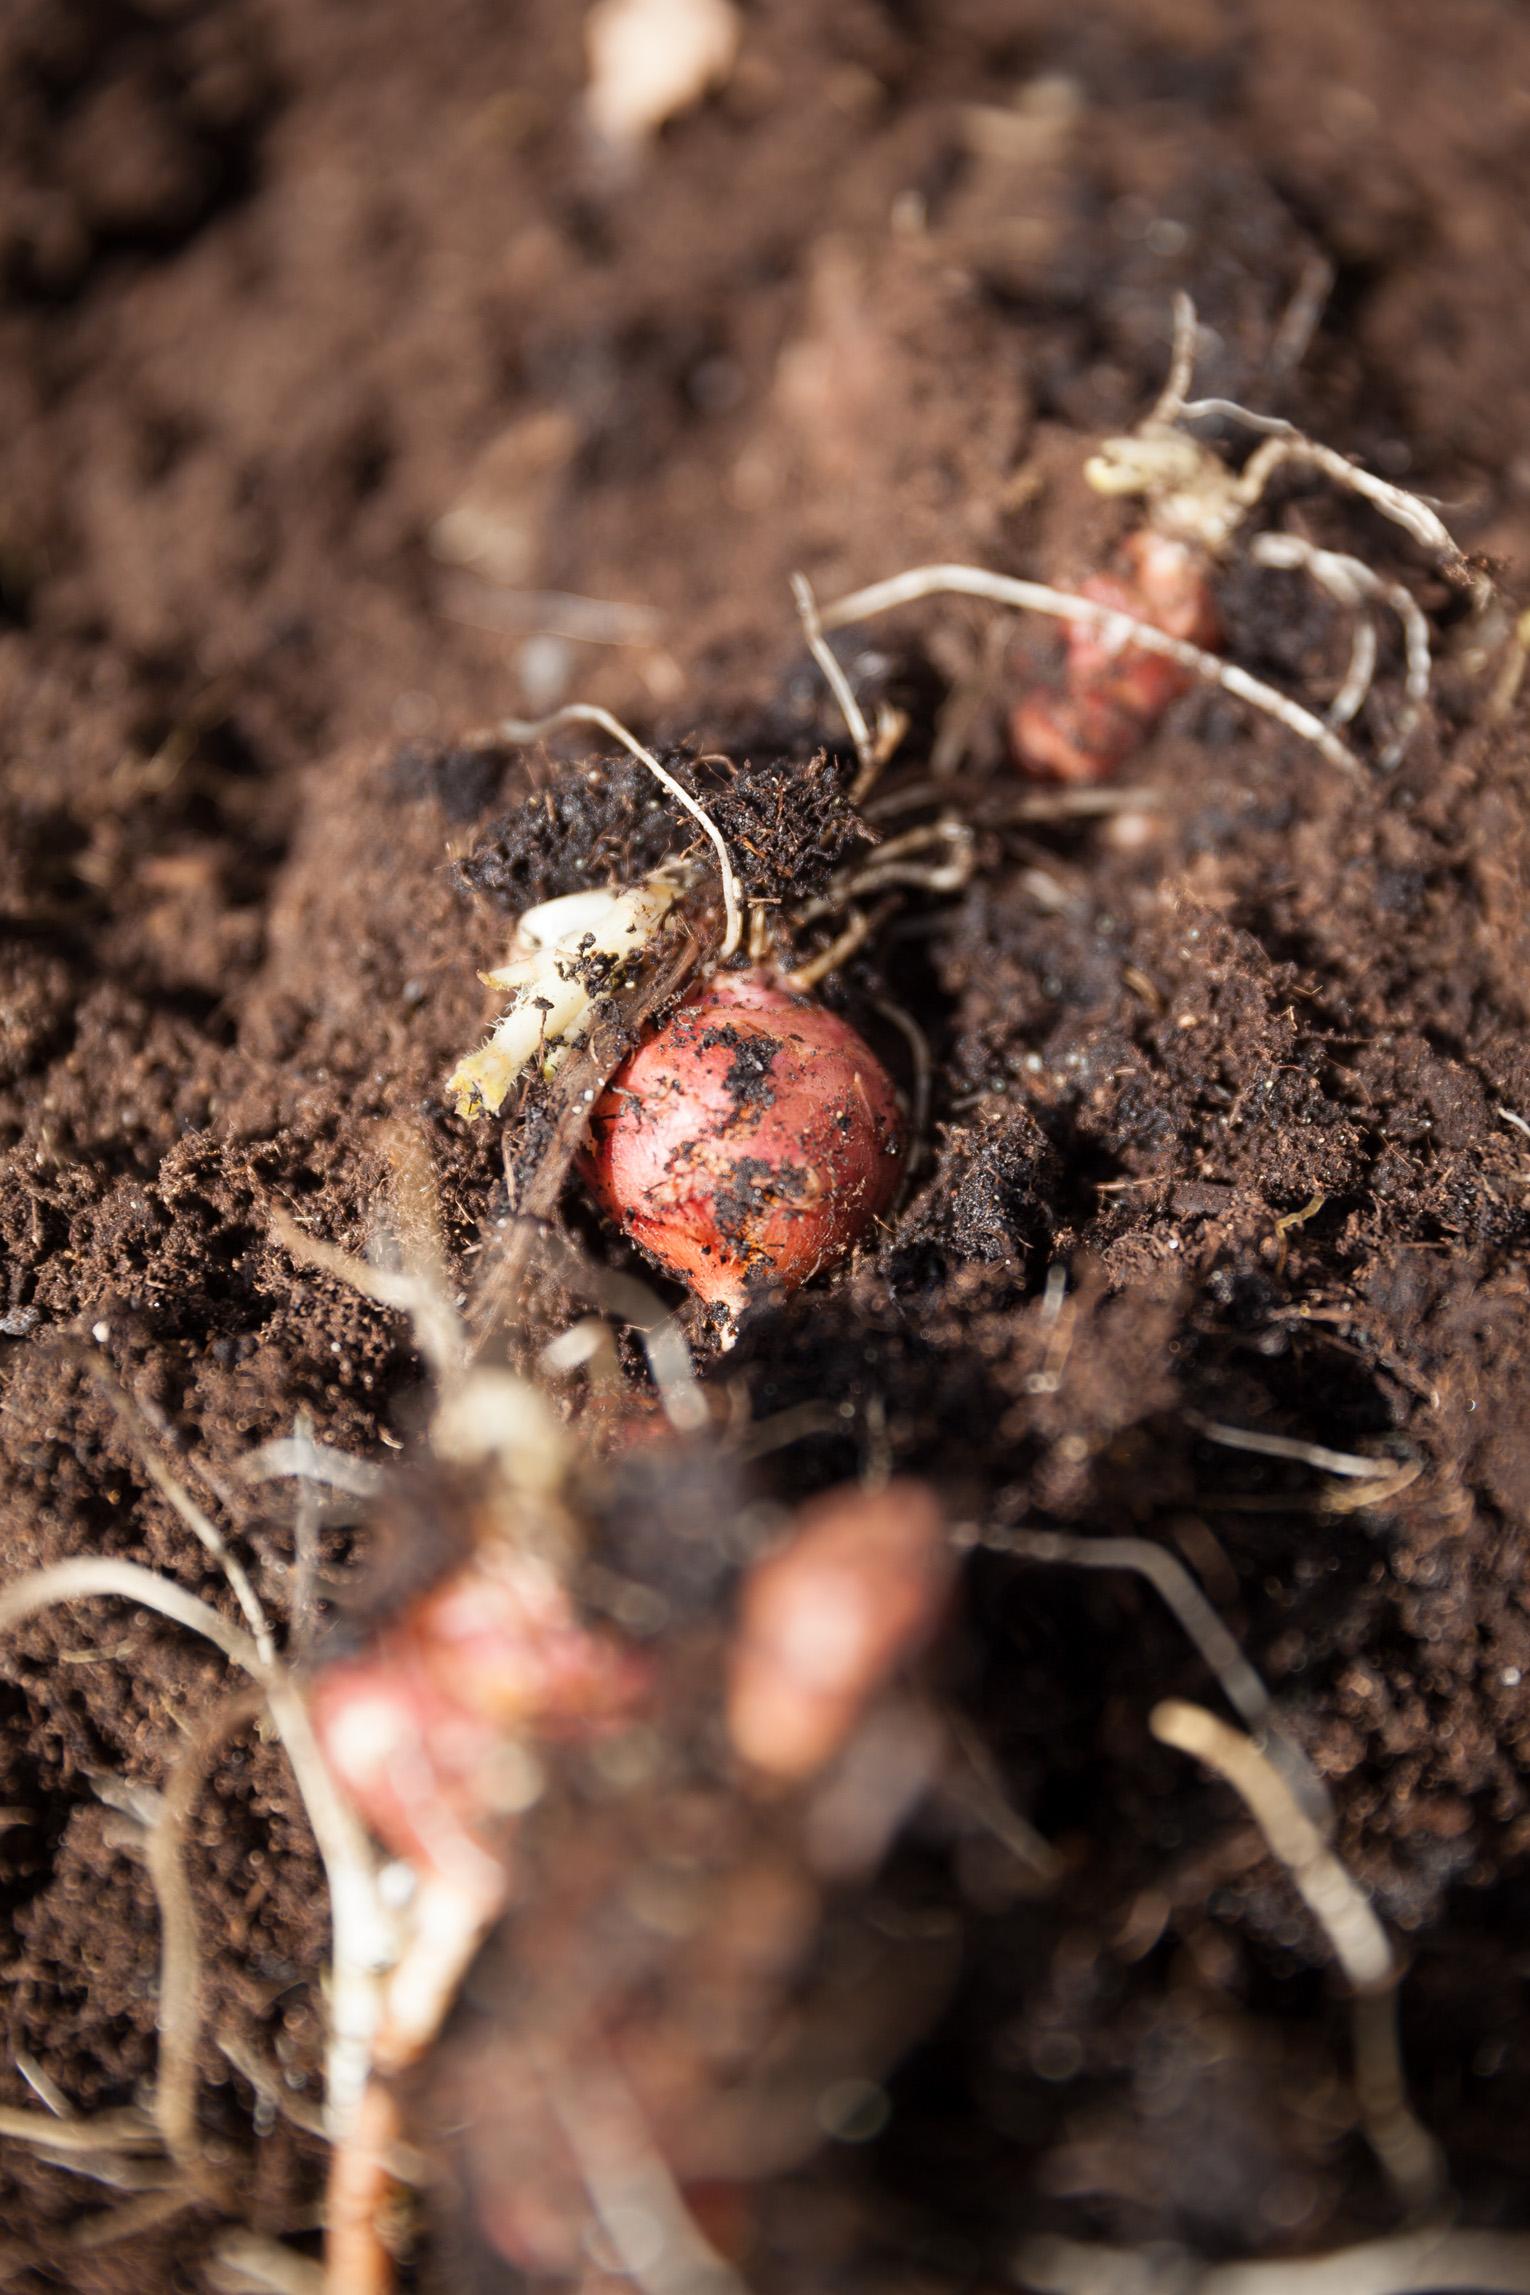 jordärtskockor i jord